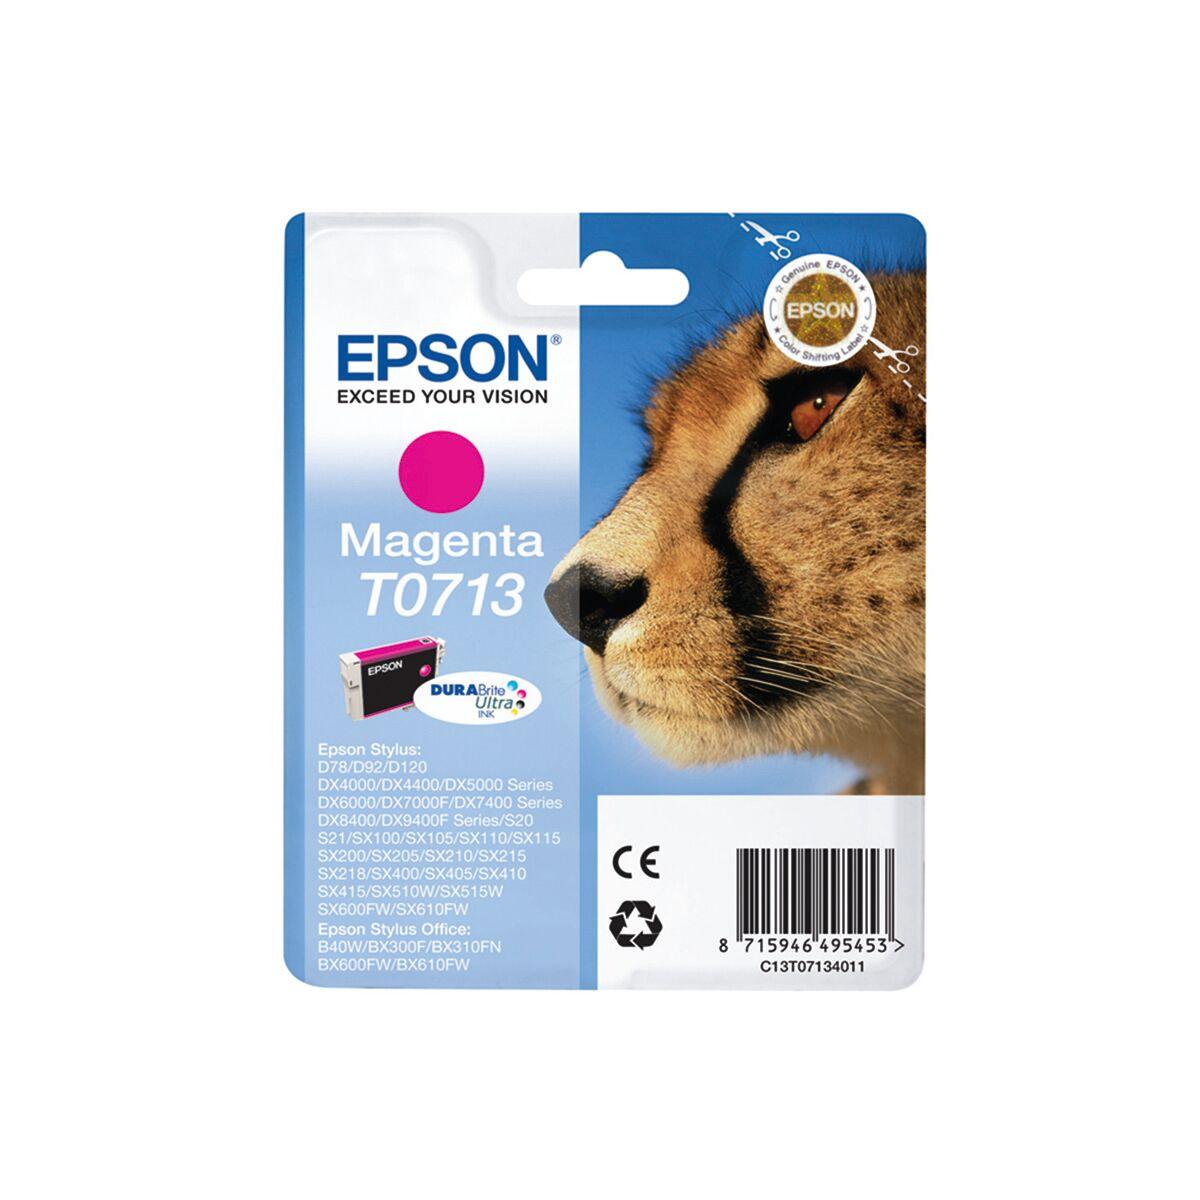 Cartouche Imprimante Epson «guépard» - T0713 - Magenta